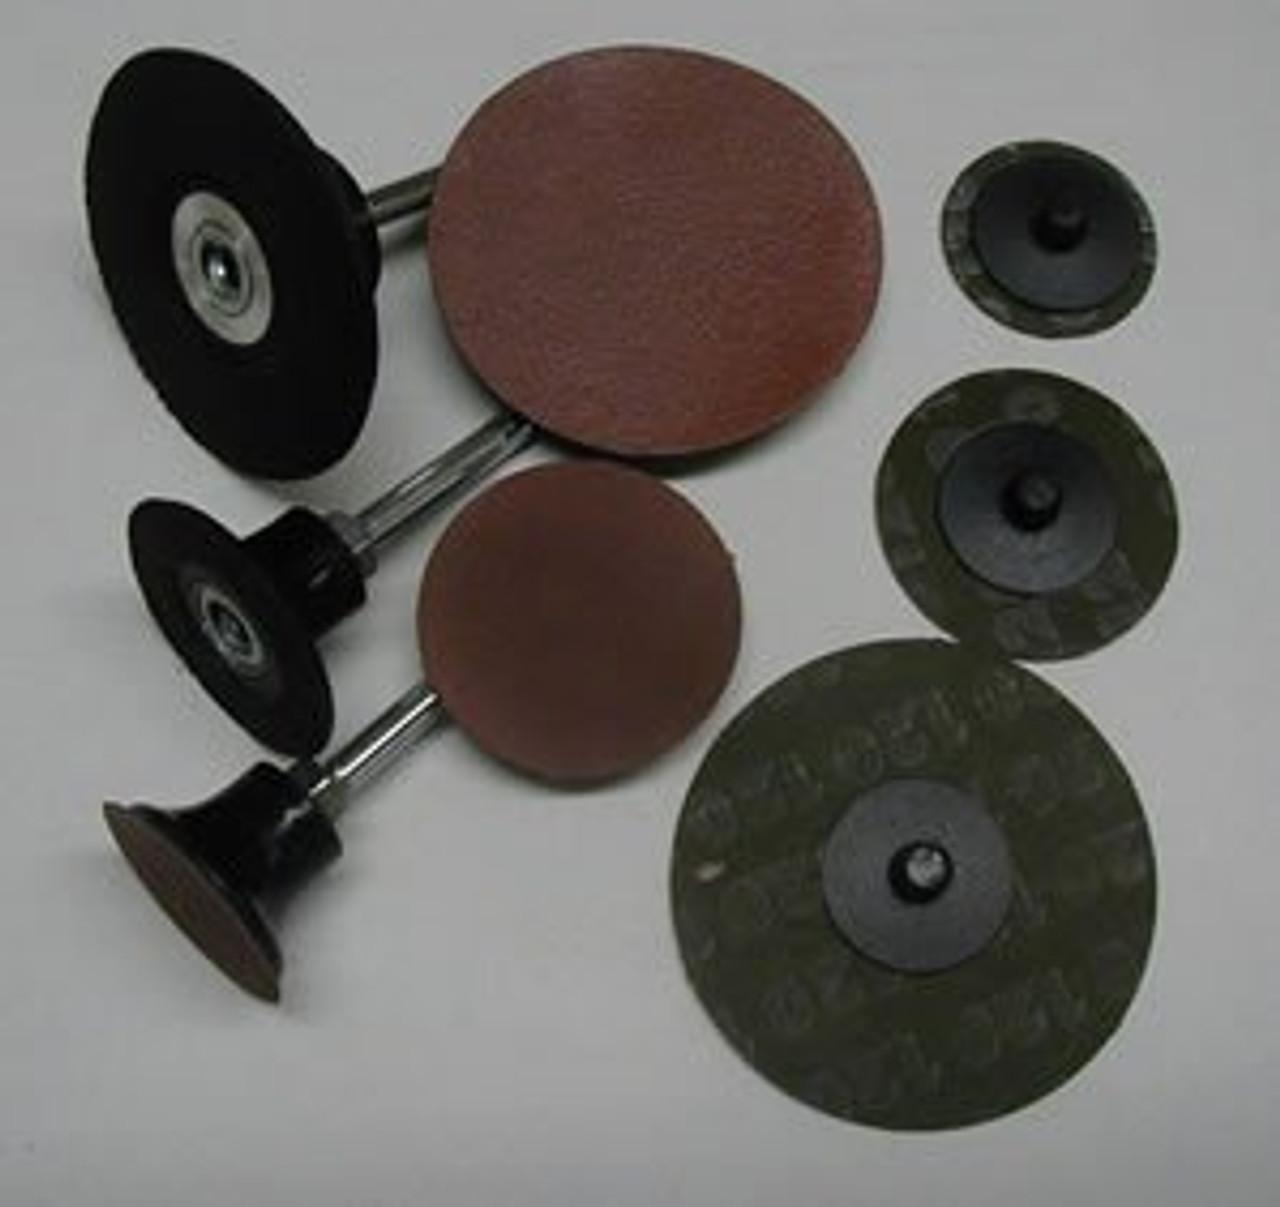 "Aluminum Oxide Sanding Disk 1.5"" - 24 Grit"